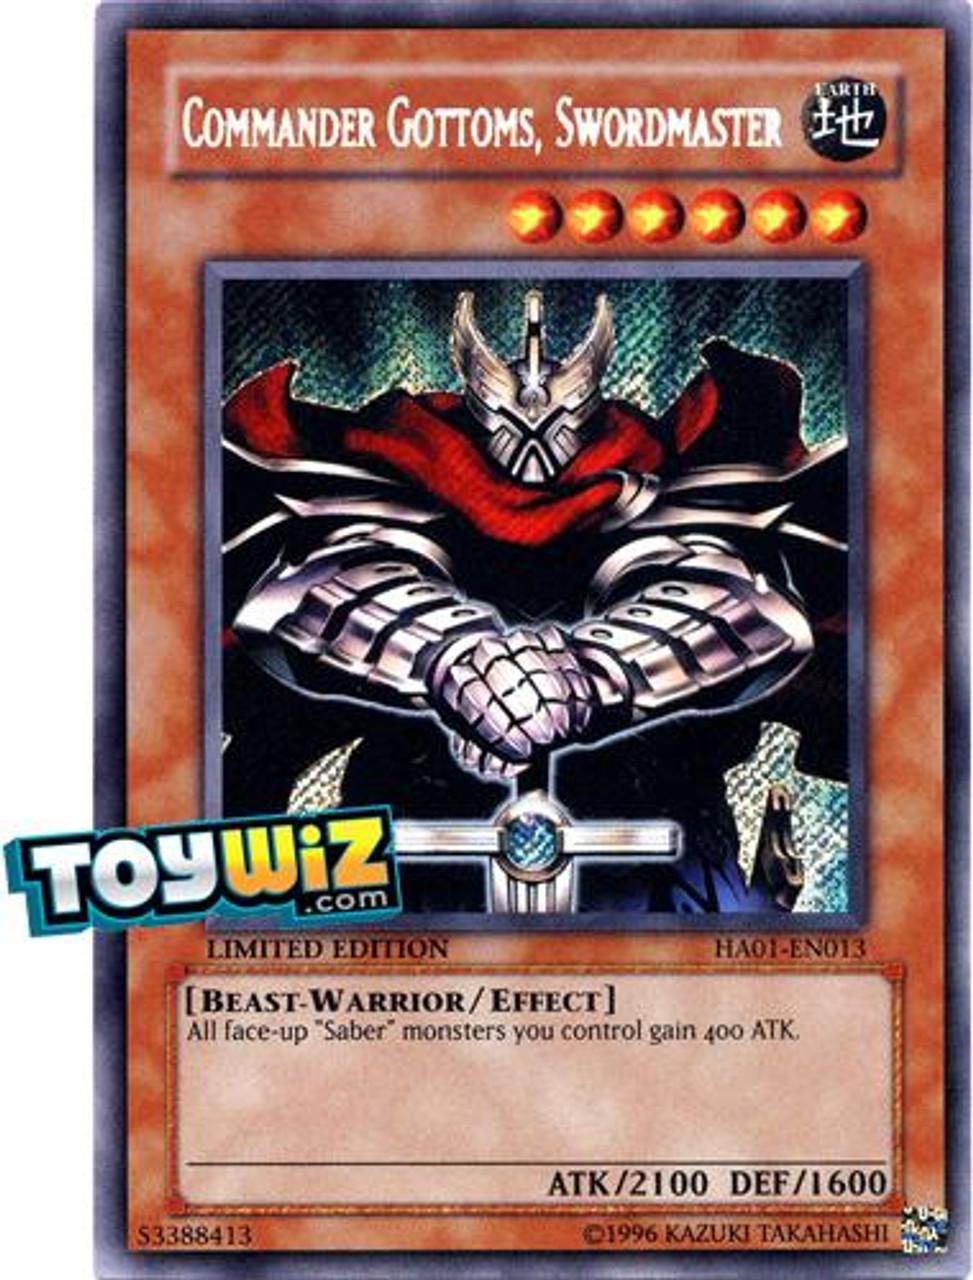 YuGiOh Hidden Arsenal 1 Secret Rare Commander Gottoms - Swordmaster HA01-EN013